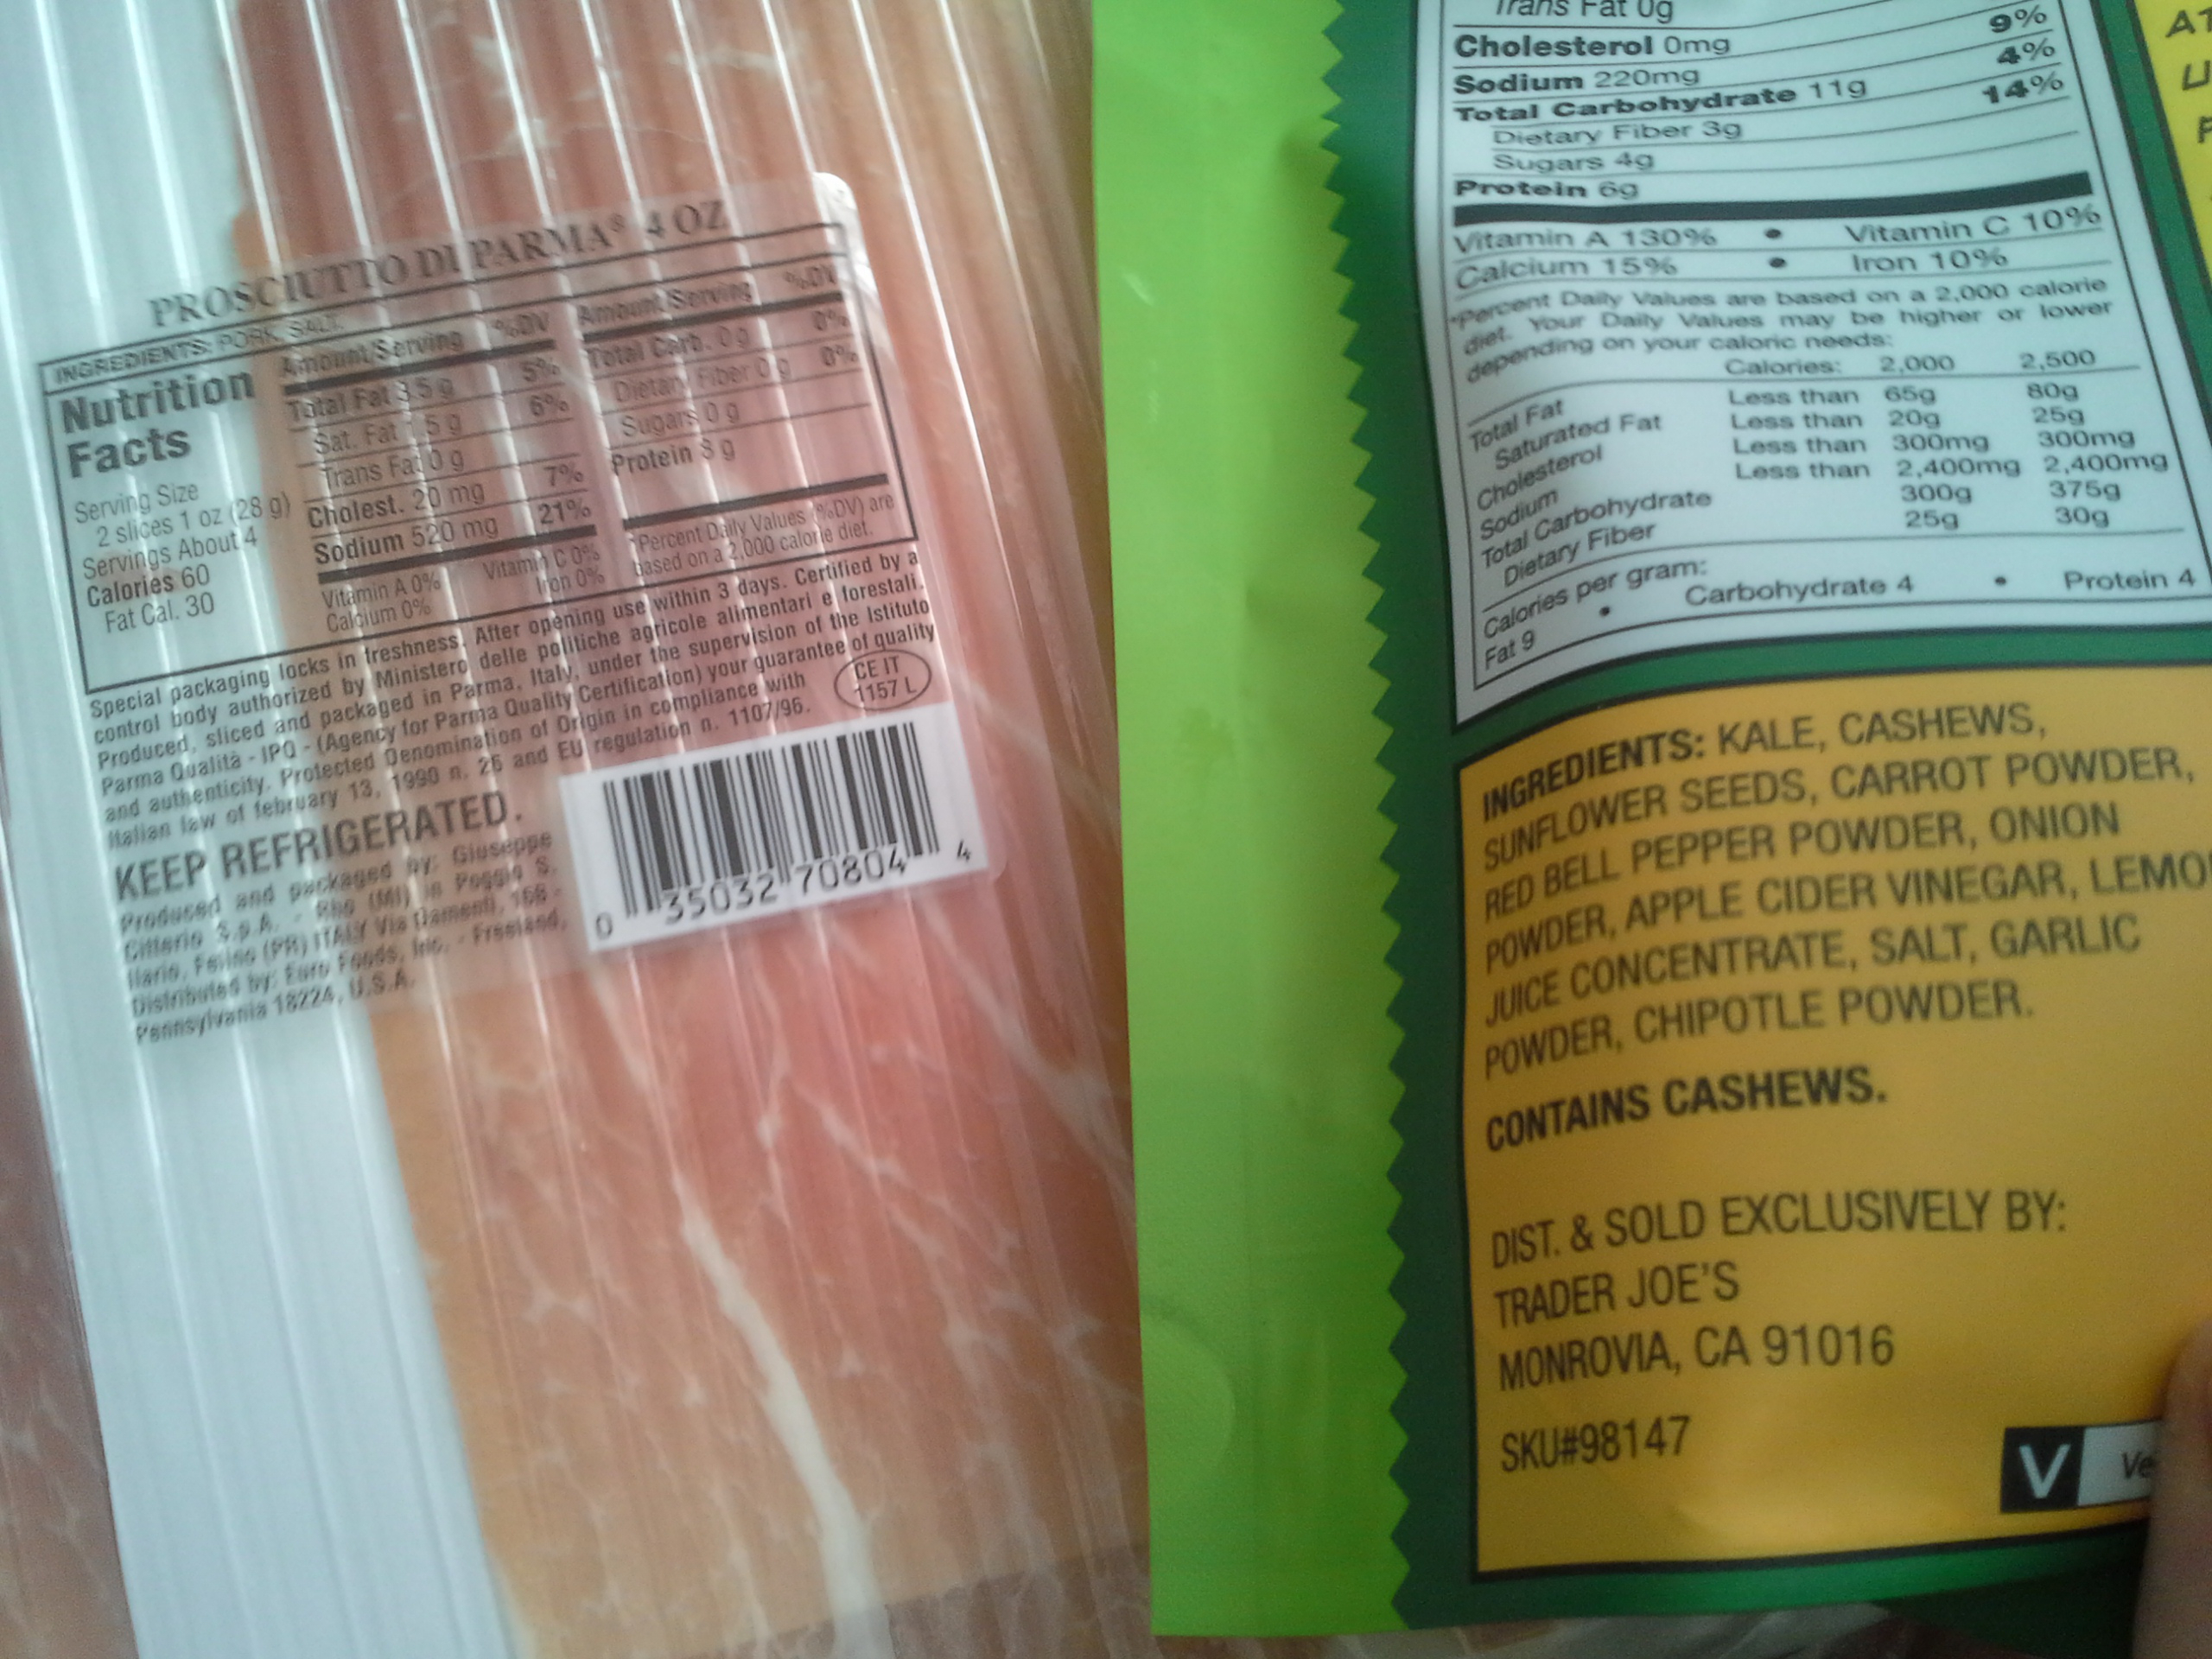 Lunch: 3:00 p.m.   4 oz. prosciutto, 2 oz. kale chips